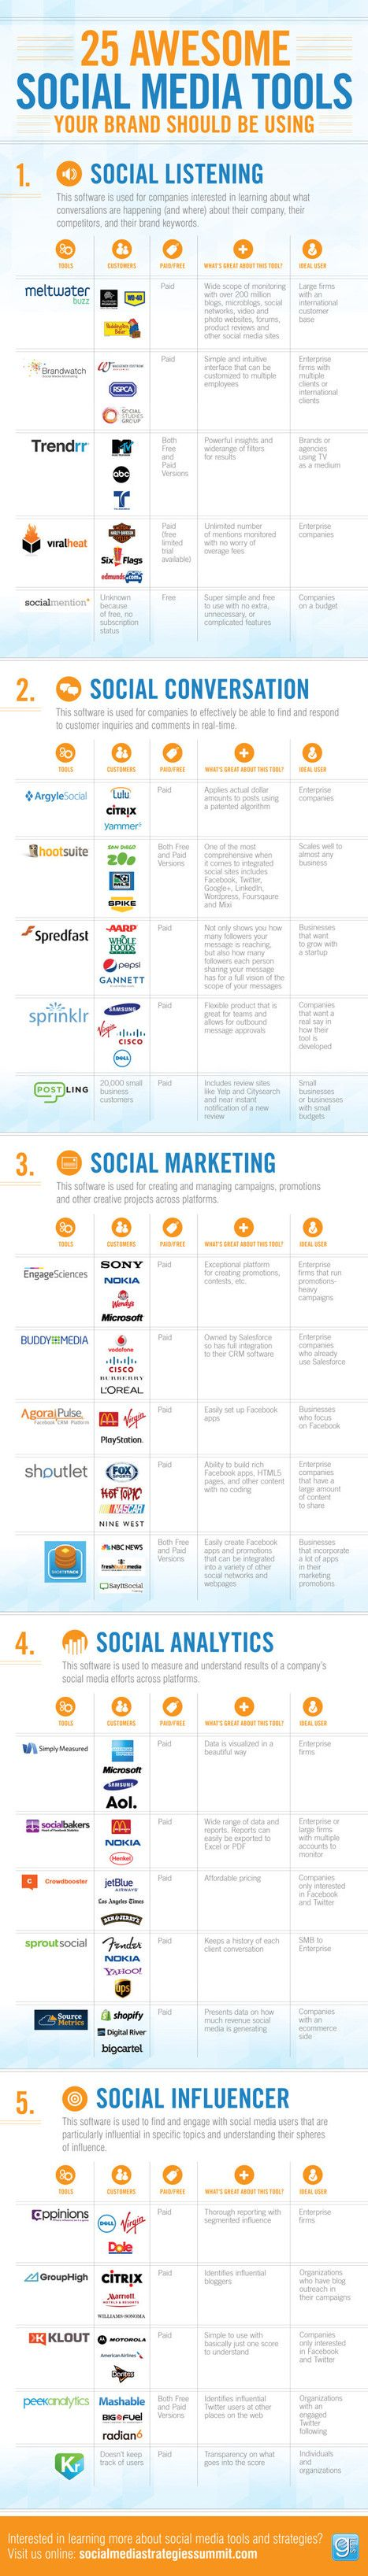 Infographic: 25 Awesome Social Media Tools - Marketing Technology Blog | #TheMarketingAutomationAlert | The Marketing Automation Alert | Sco...